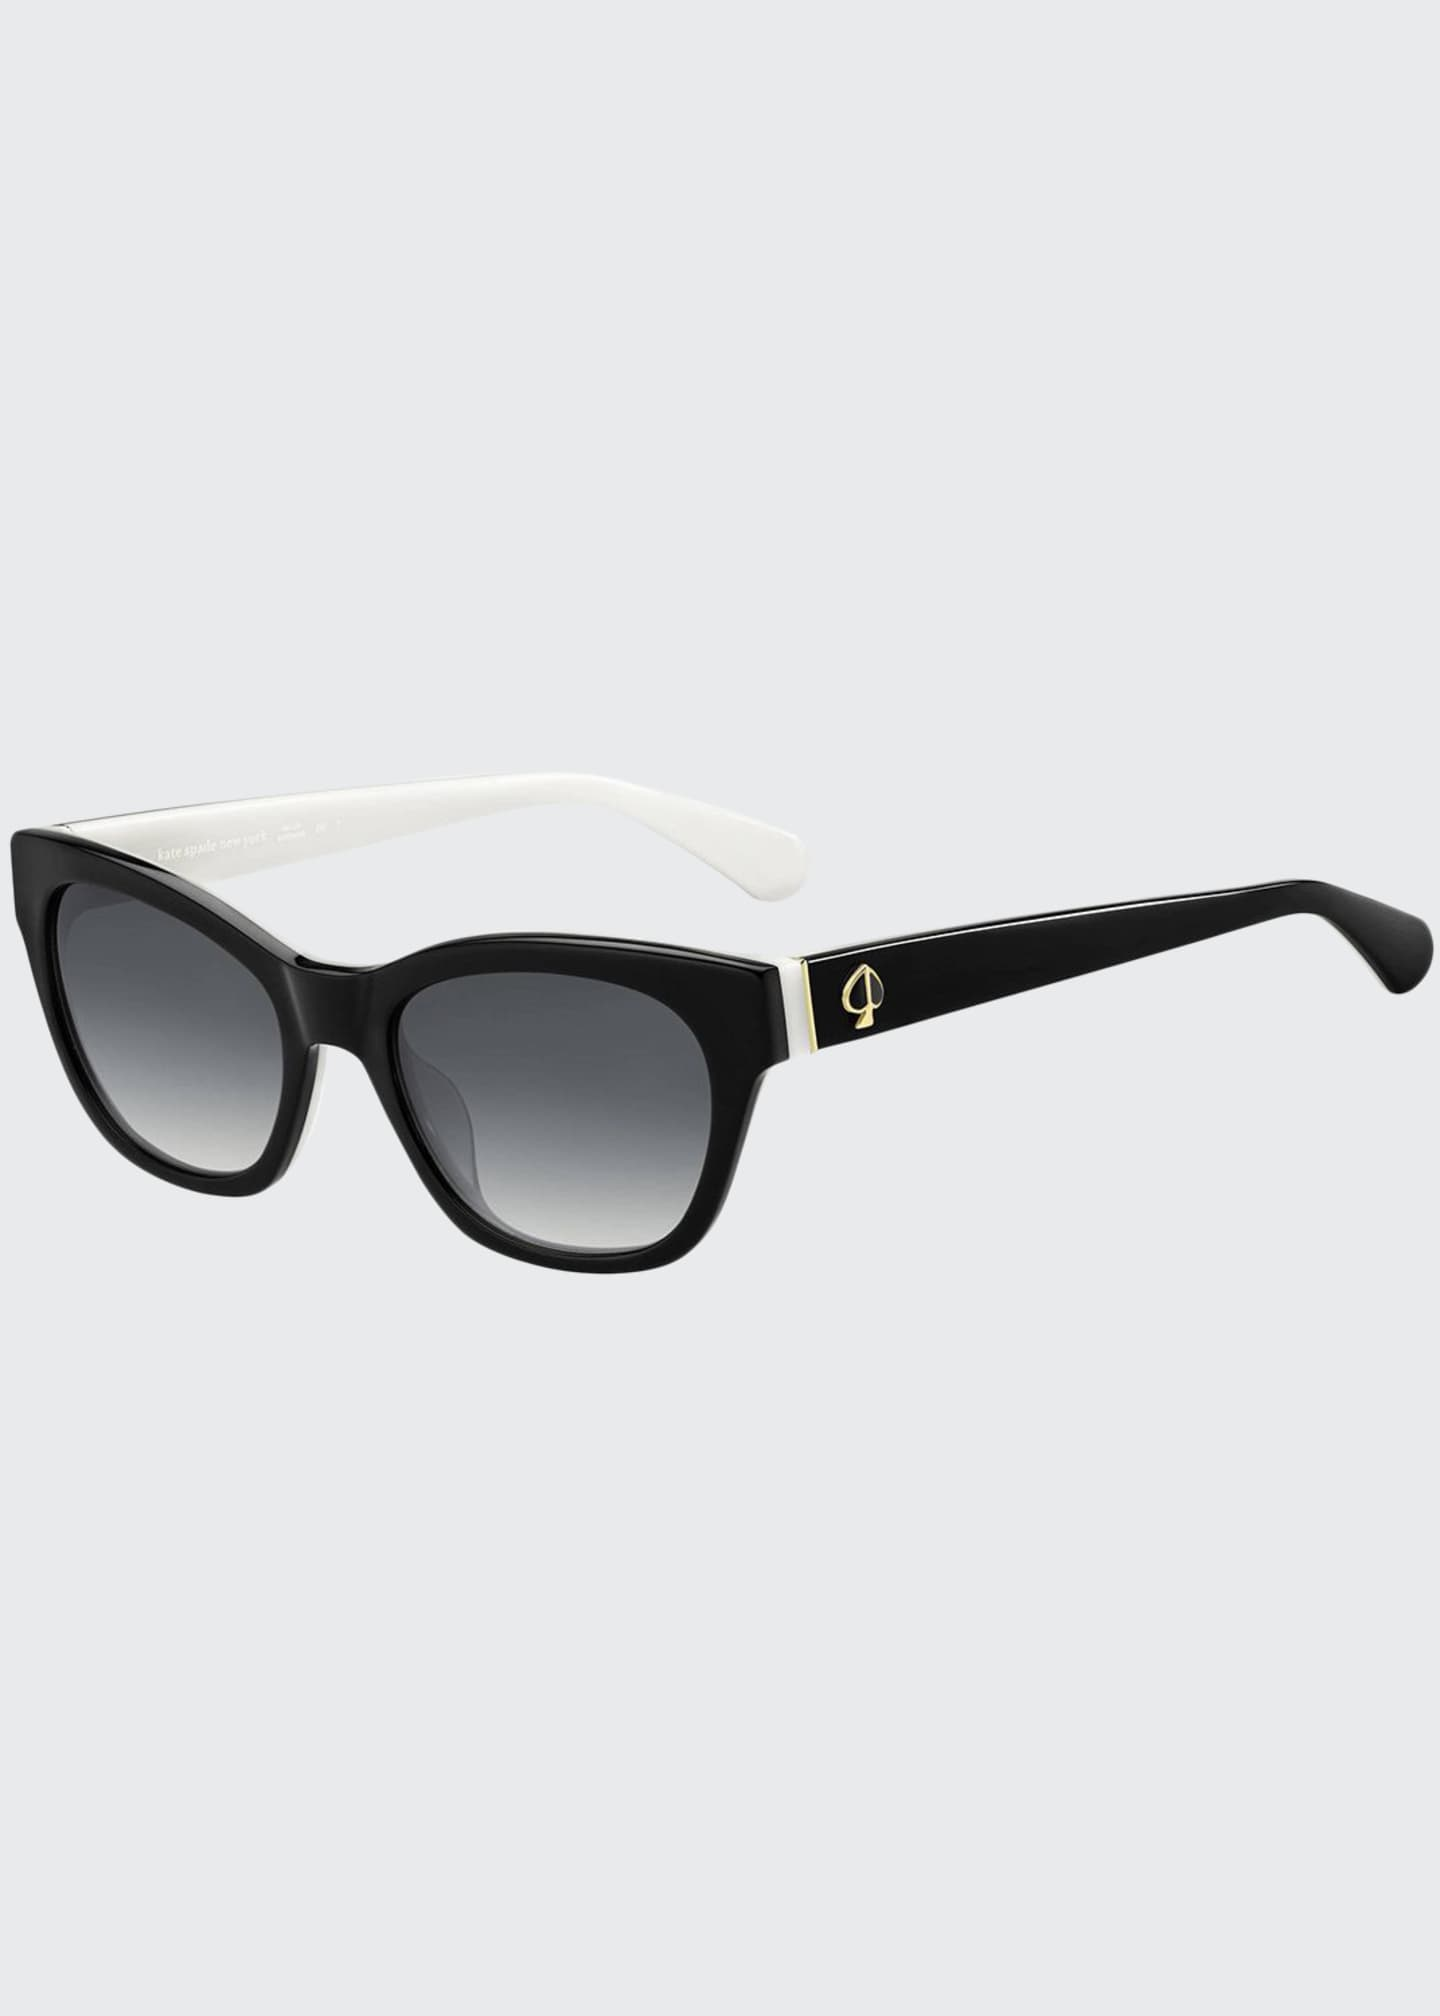 kate spade new york jerris rectangle acetate sunglasses